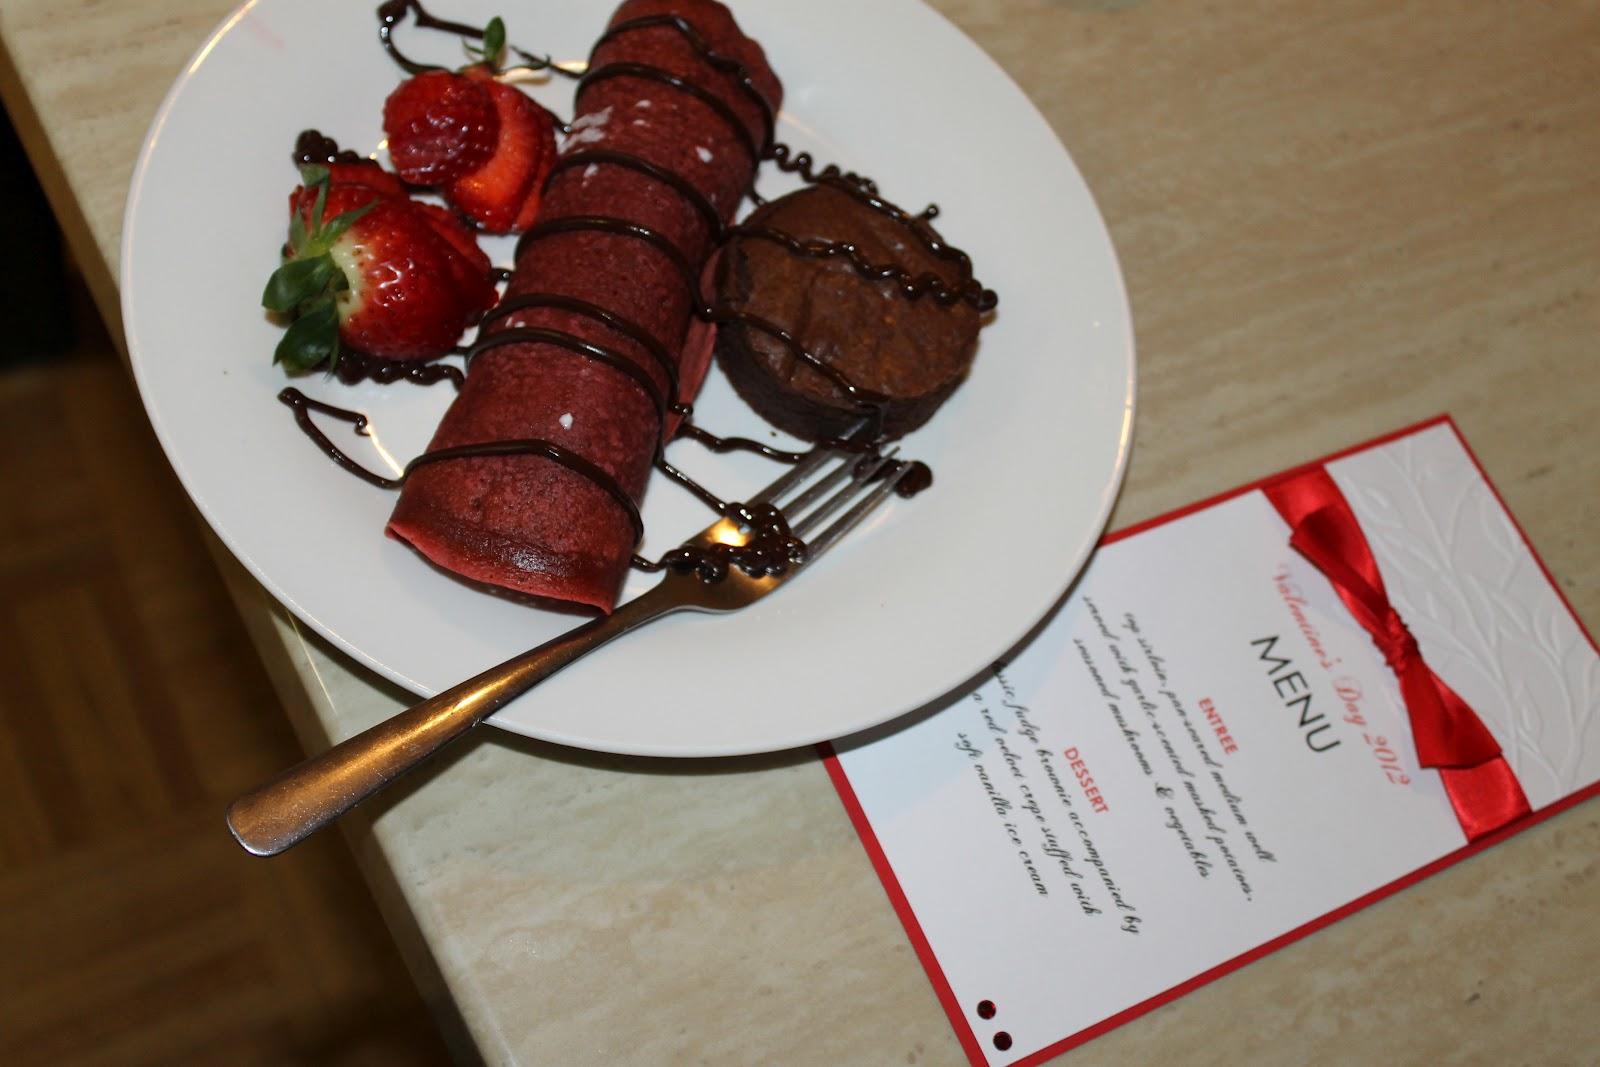 Mom S 50th Birthday Caloriecount 2014 01 15 Gift Idea For